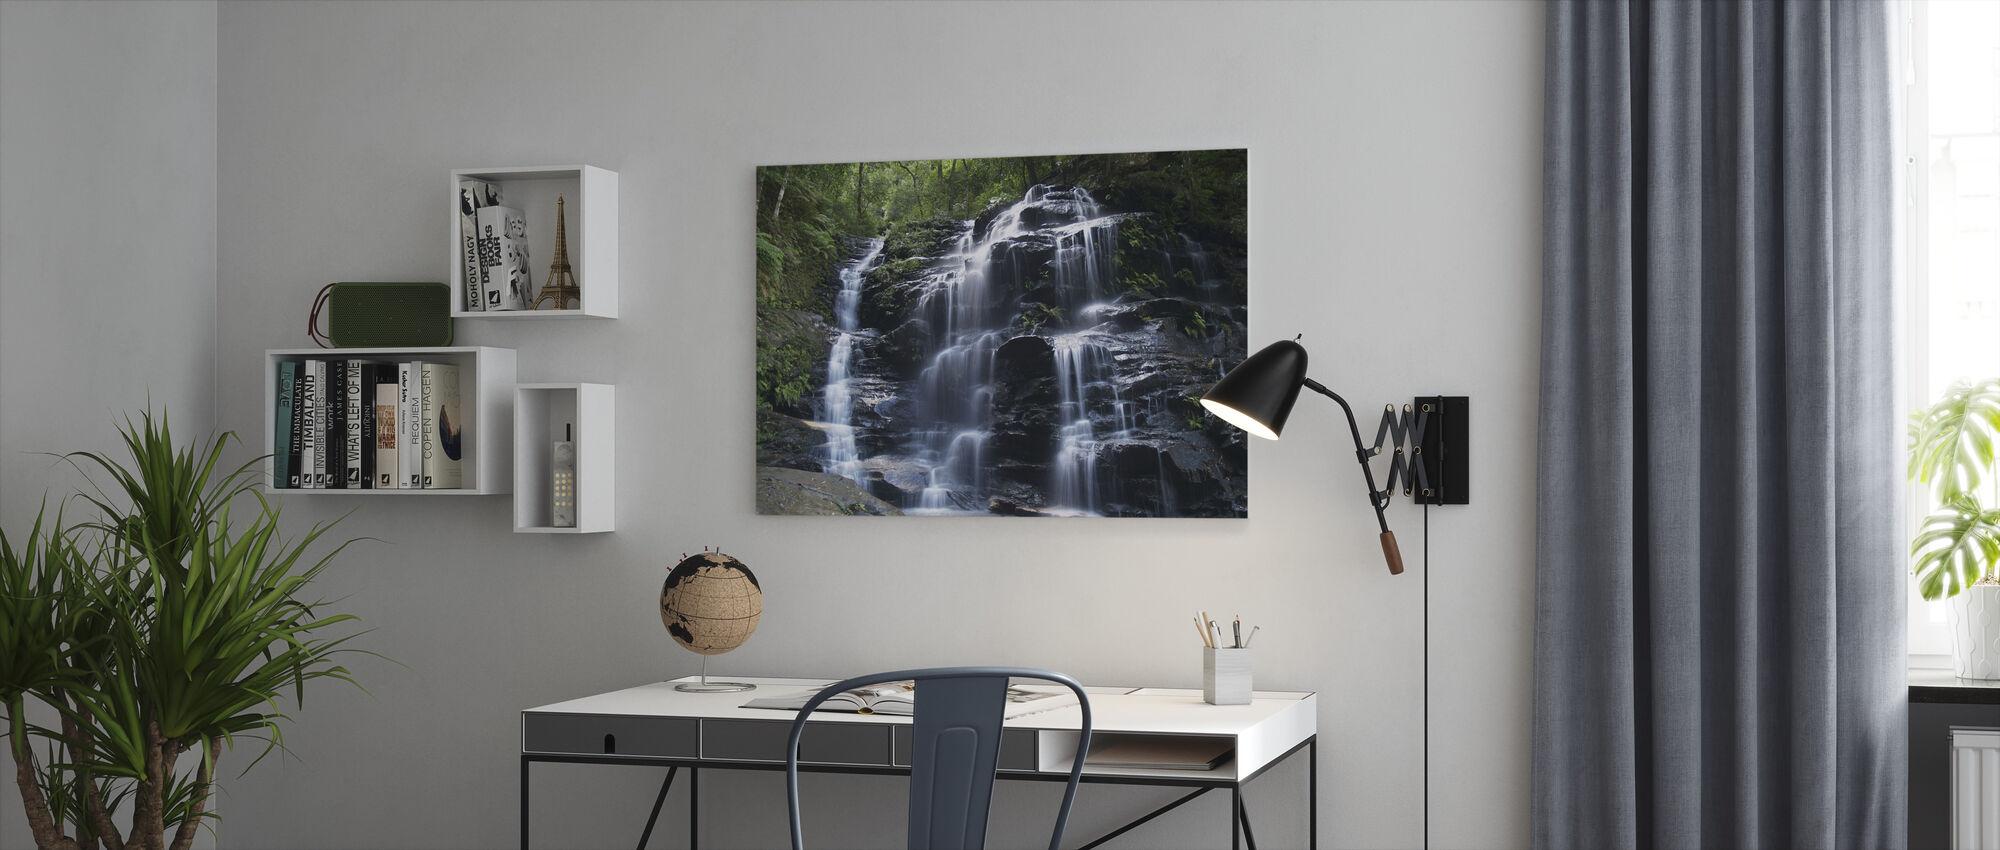 Amazon Waterfall - Canvas print - Office